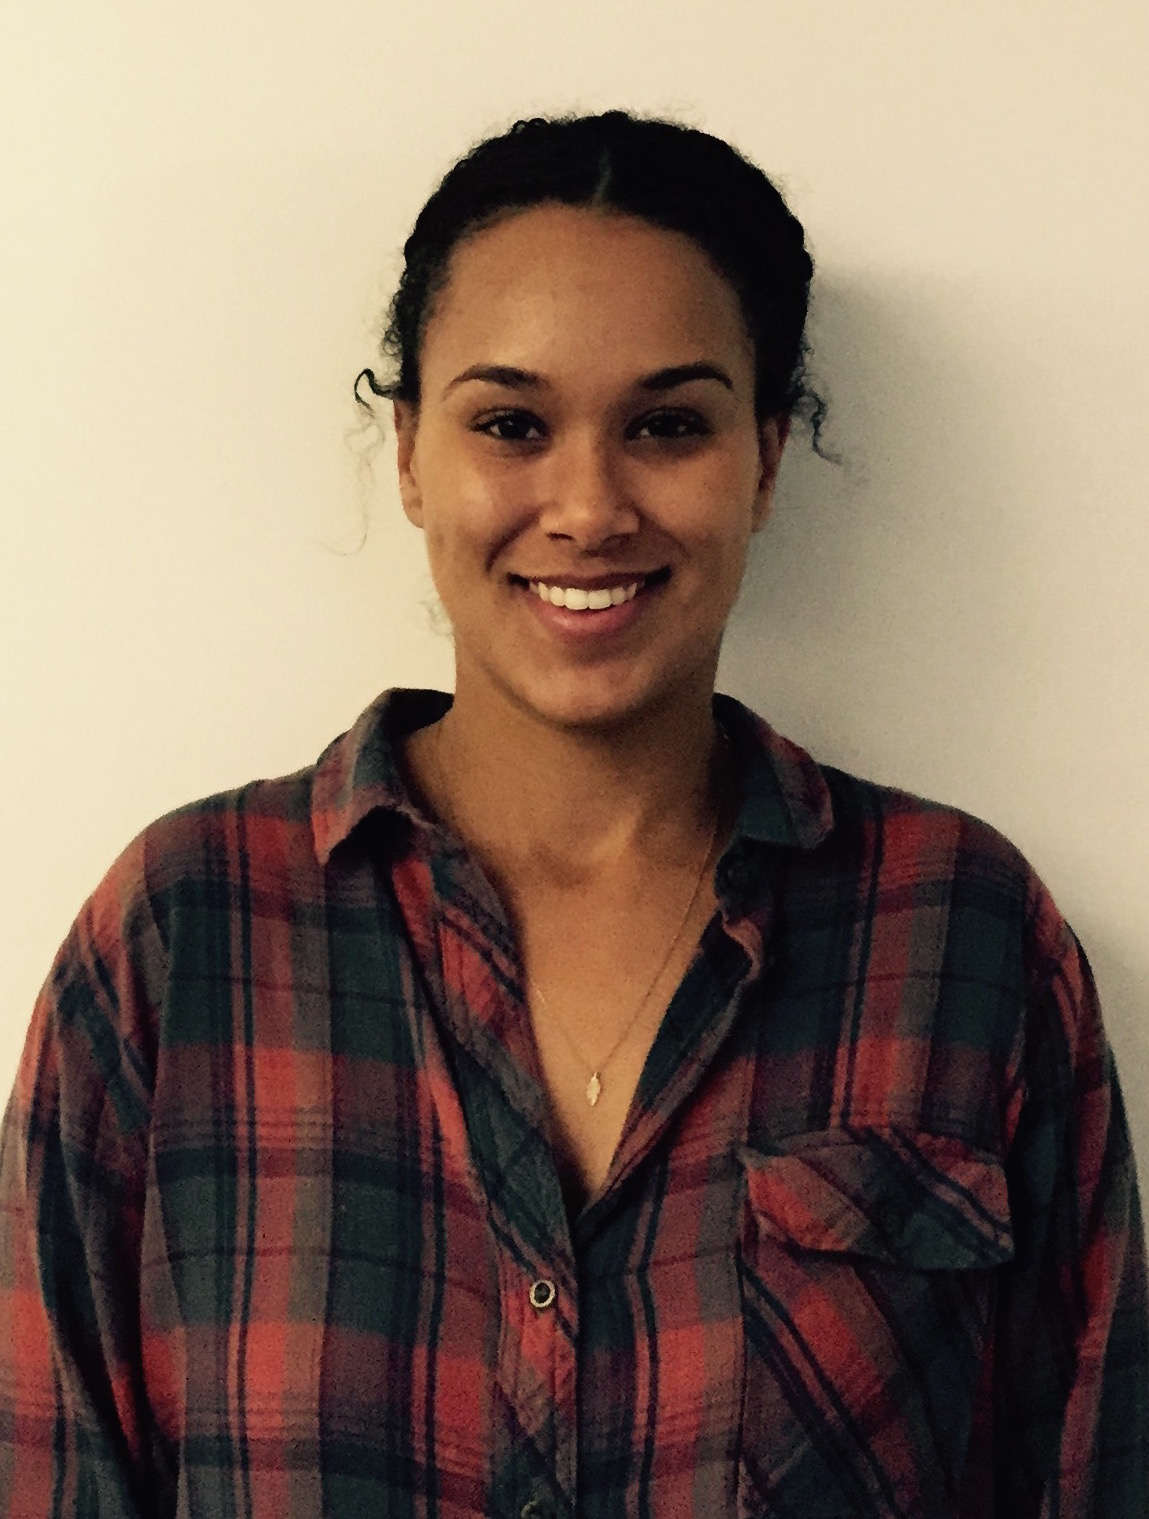 Jordan Eliasson, Pepperdine student